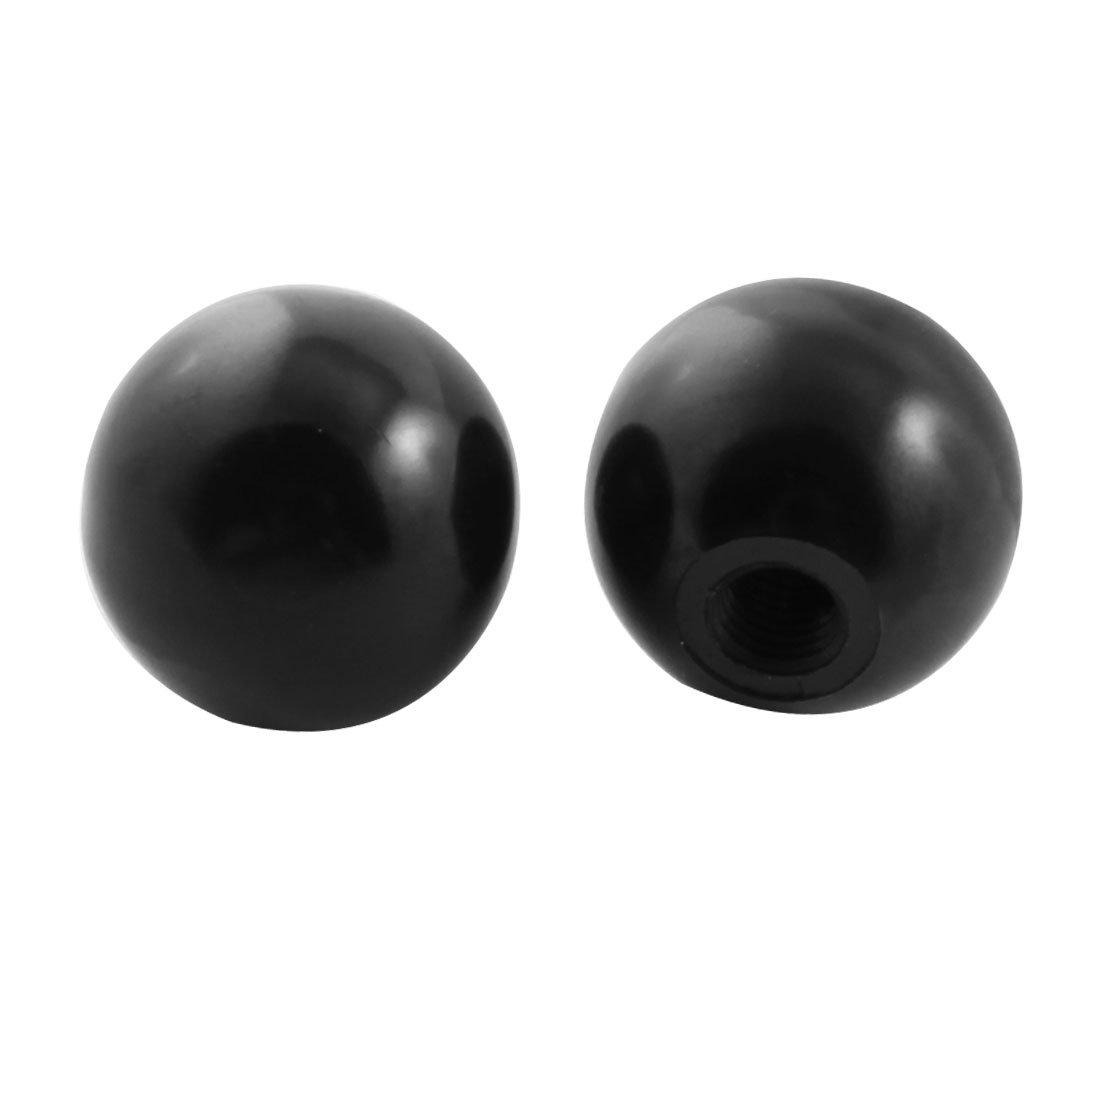 2Pcs M10x35mm Thread Round Plastic 35mm Diameter Ball Lever Knob Black